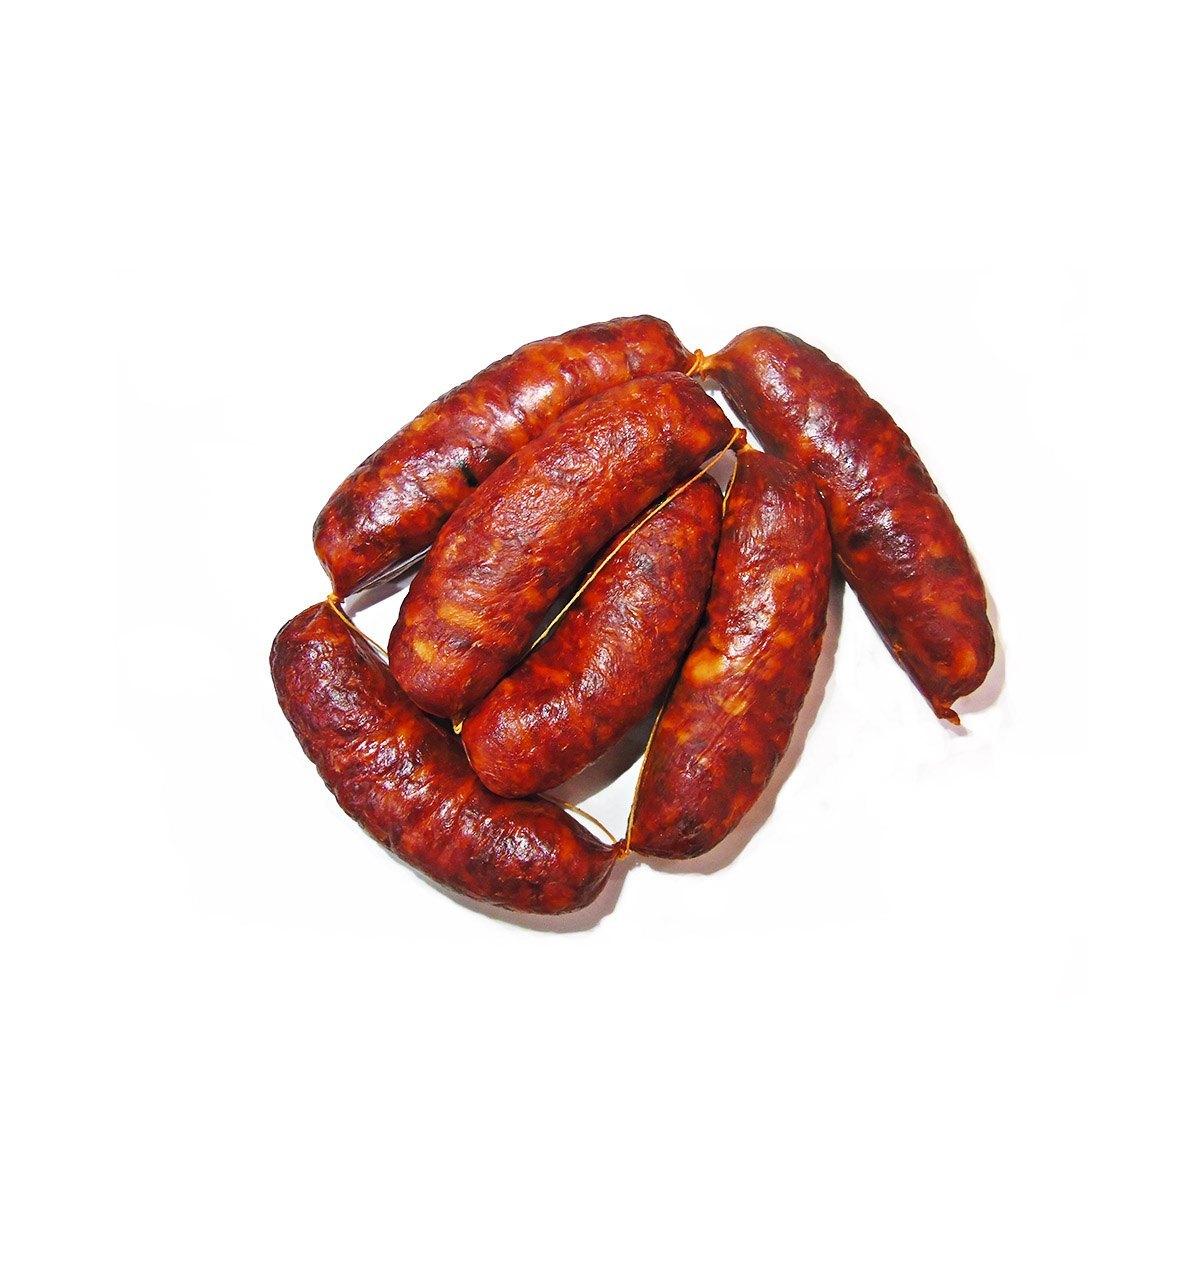 Comprar Chorizo rojo casero de Galicia